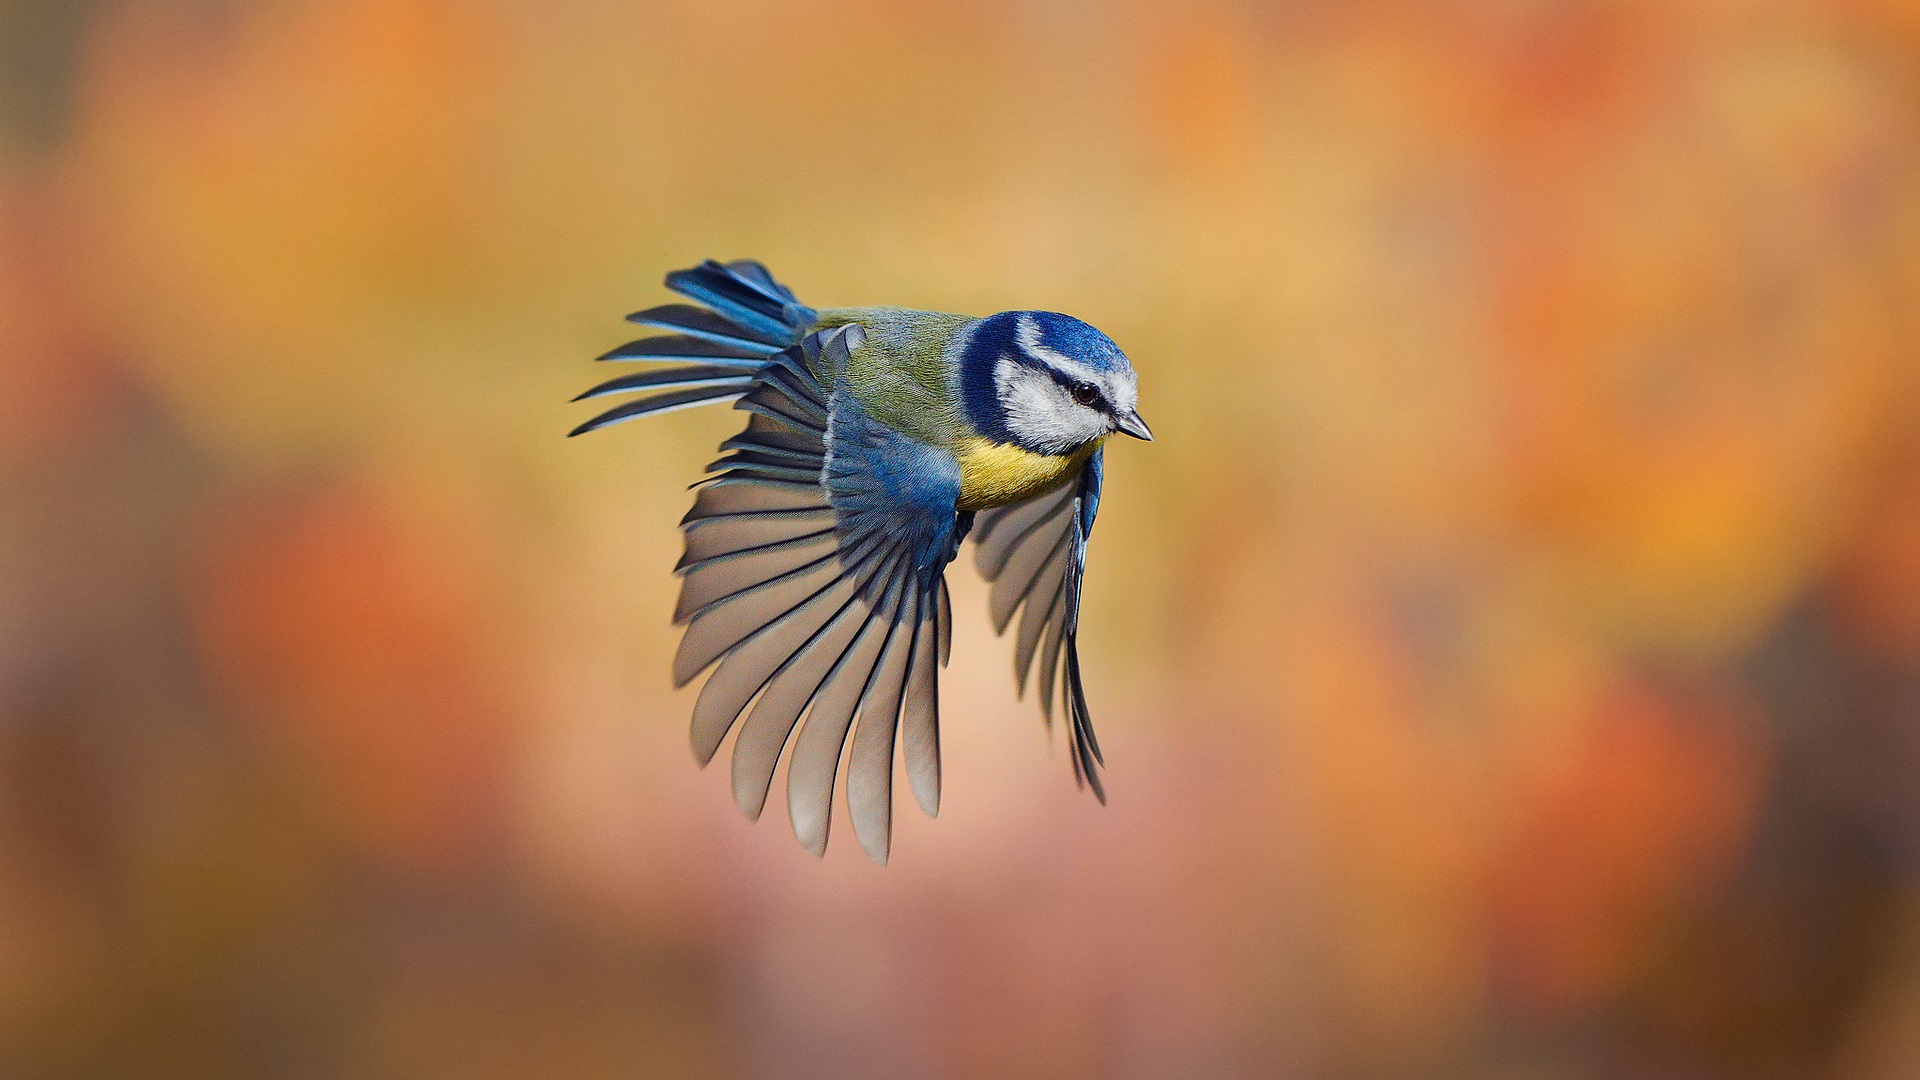 bird close up chickadee flying blur background wallpaper